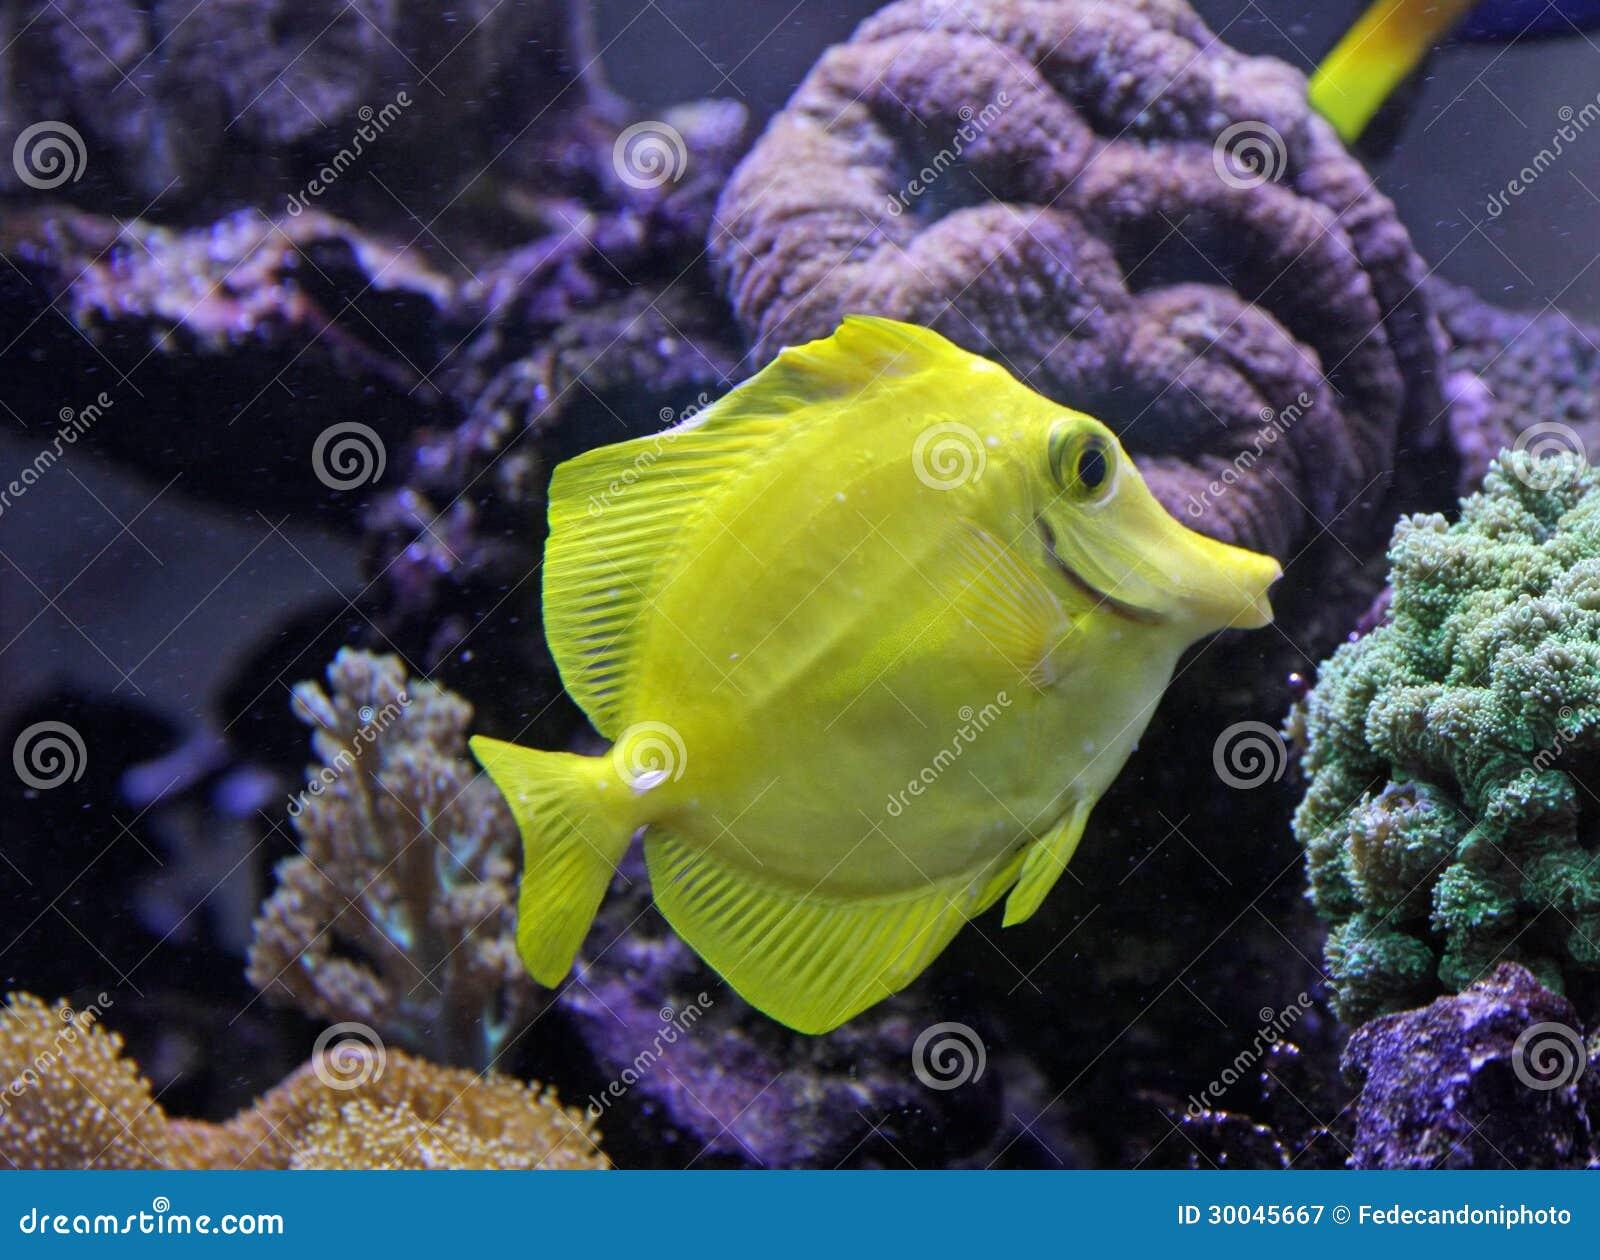 Beautiful tropical fish swimming in an aquarium royalty for Beautiful tropical fish